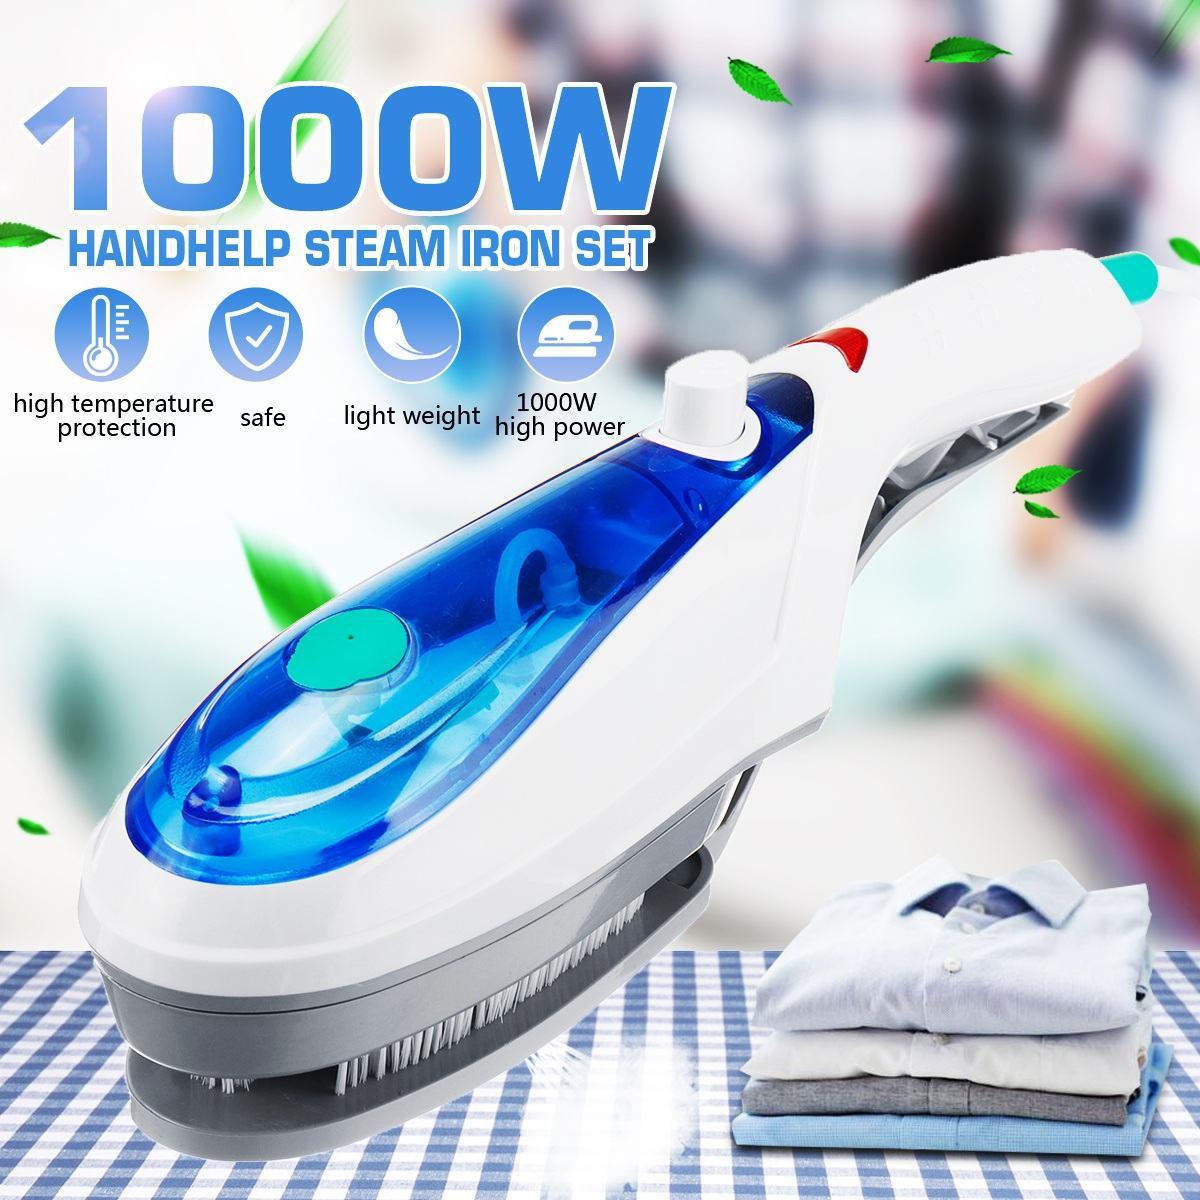 1000W Handheld Garment Steamer Brush Portable Steam Iron For Clothes Generator Ironing Steamer EU/US/AU Plug 110V-240V